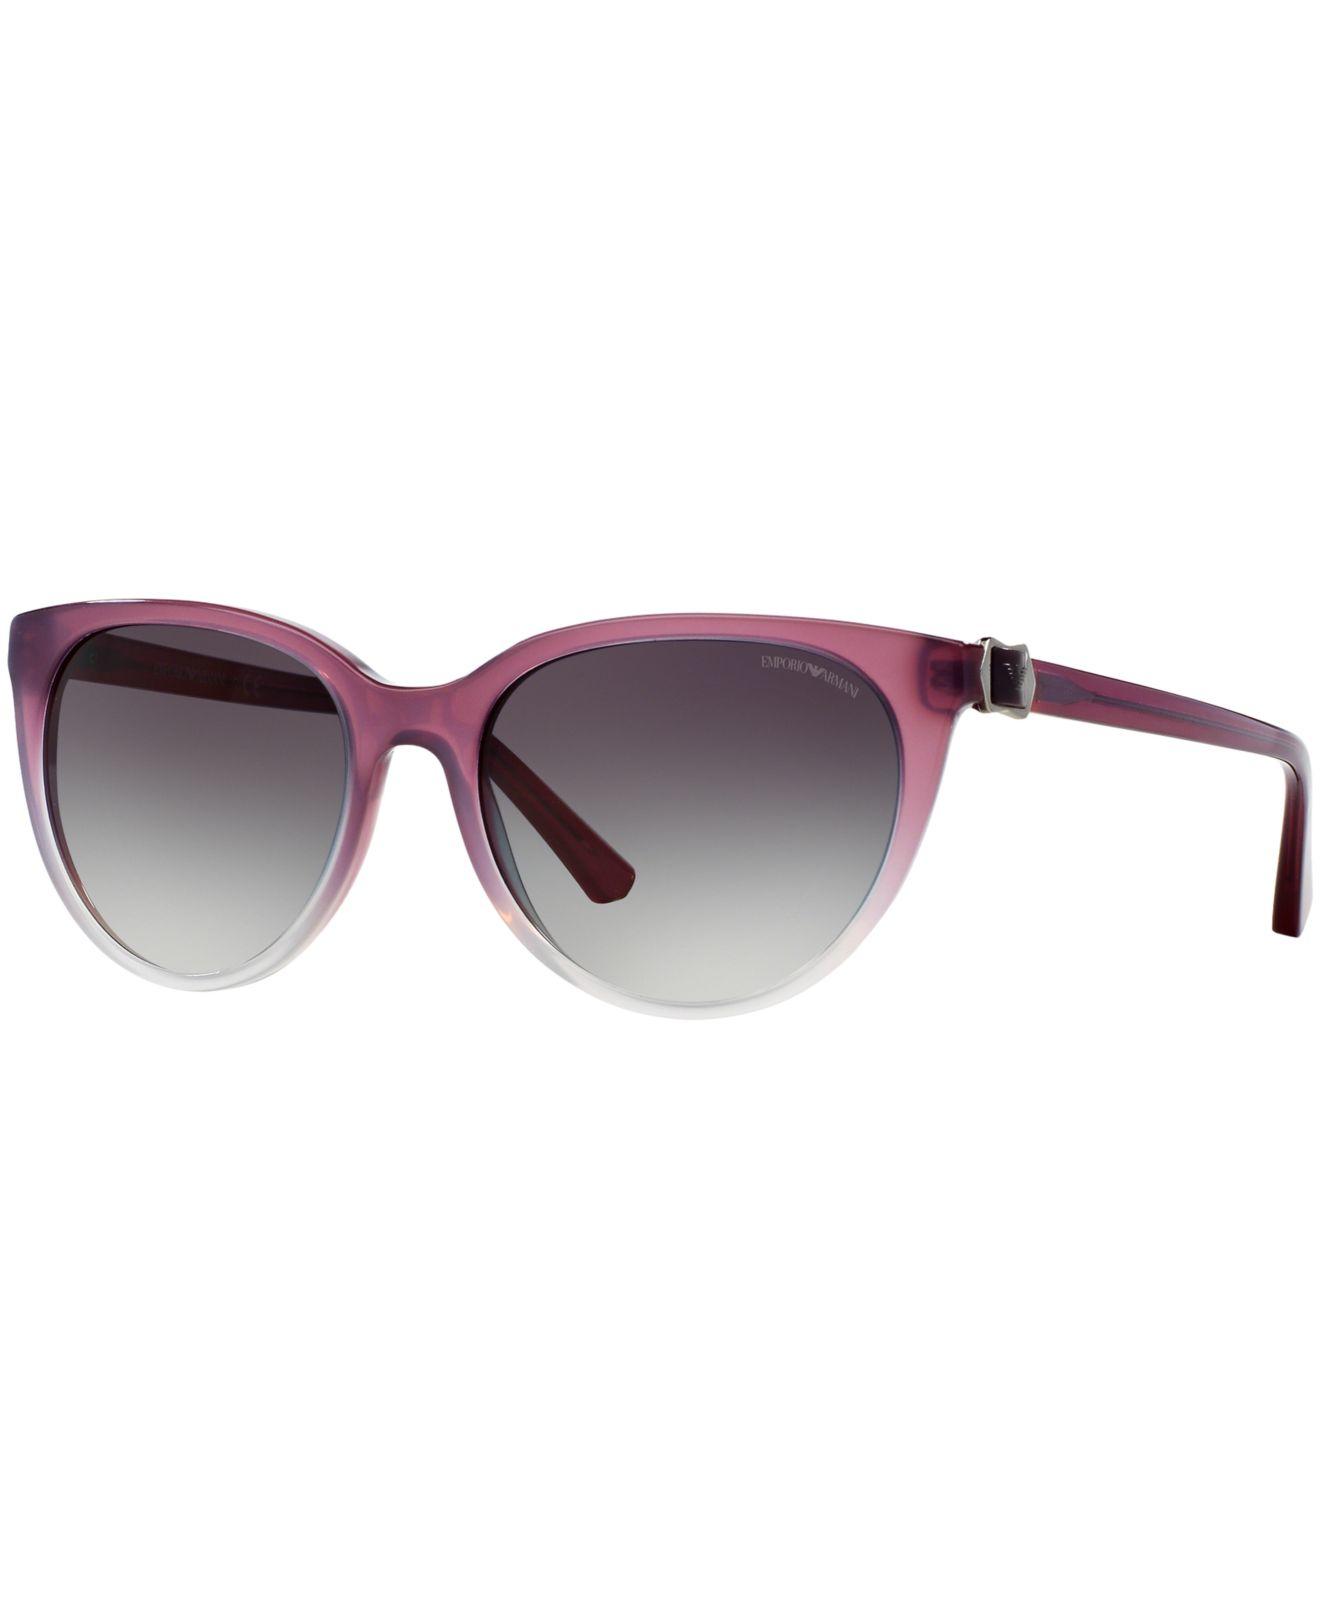 de668daf52 Luxottica Sunglasses Ray Ban Amazon Music - Hibernian Coins and Notes